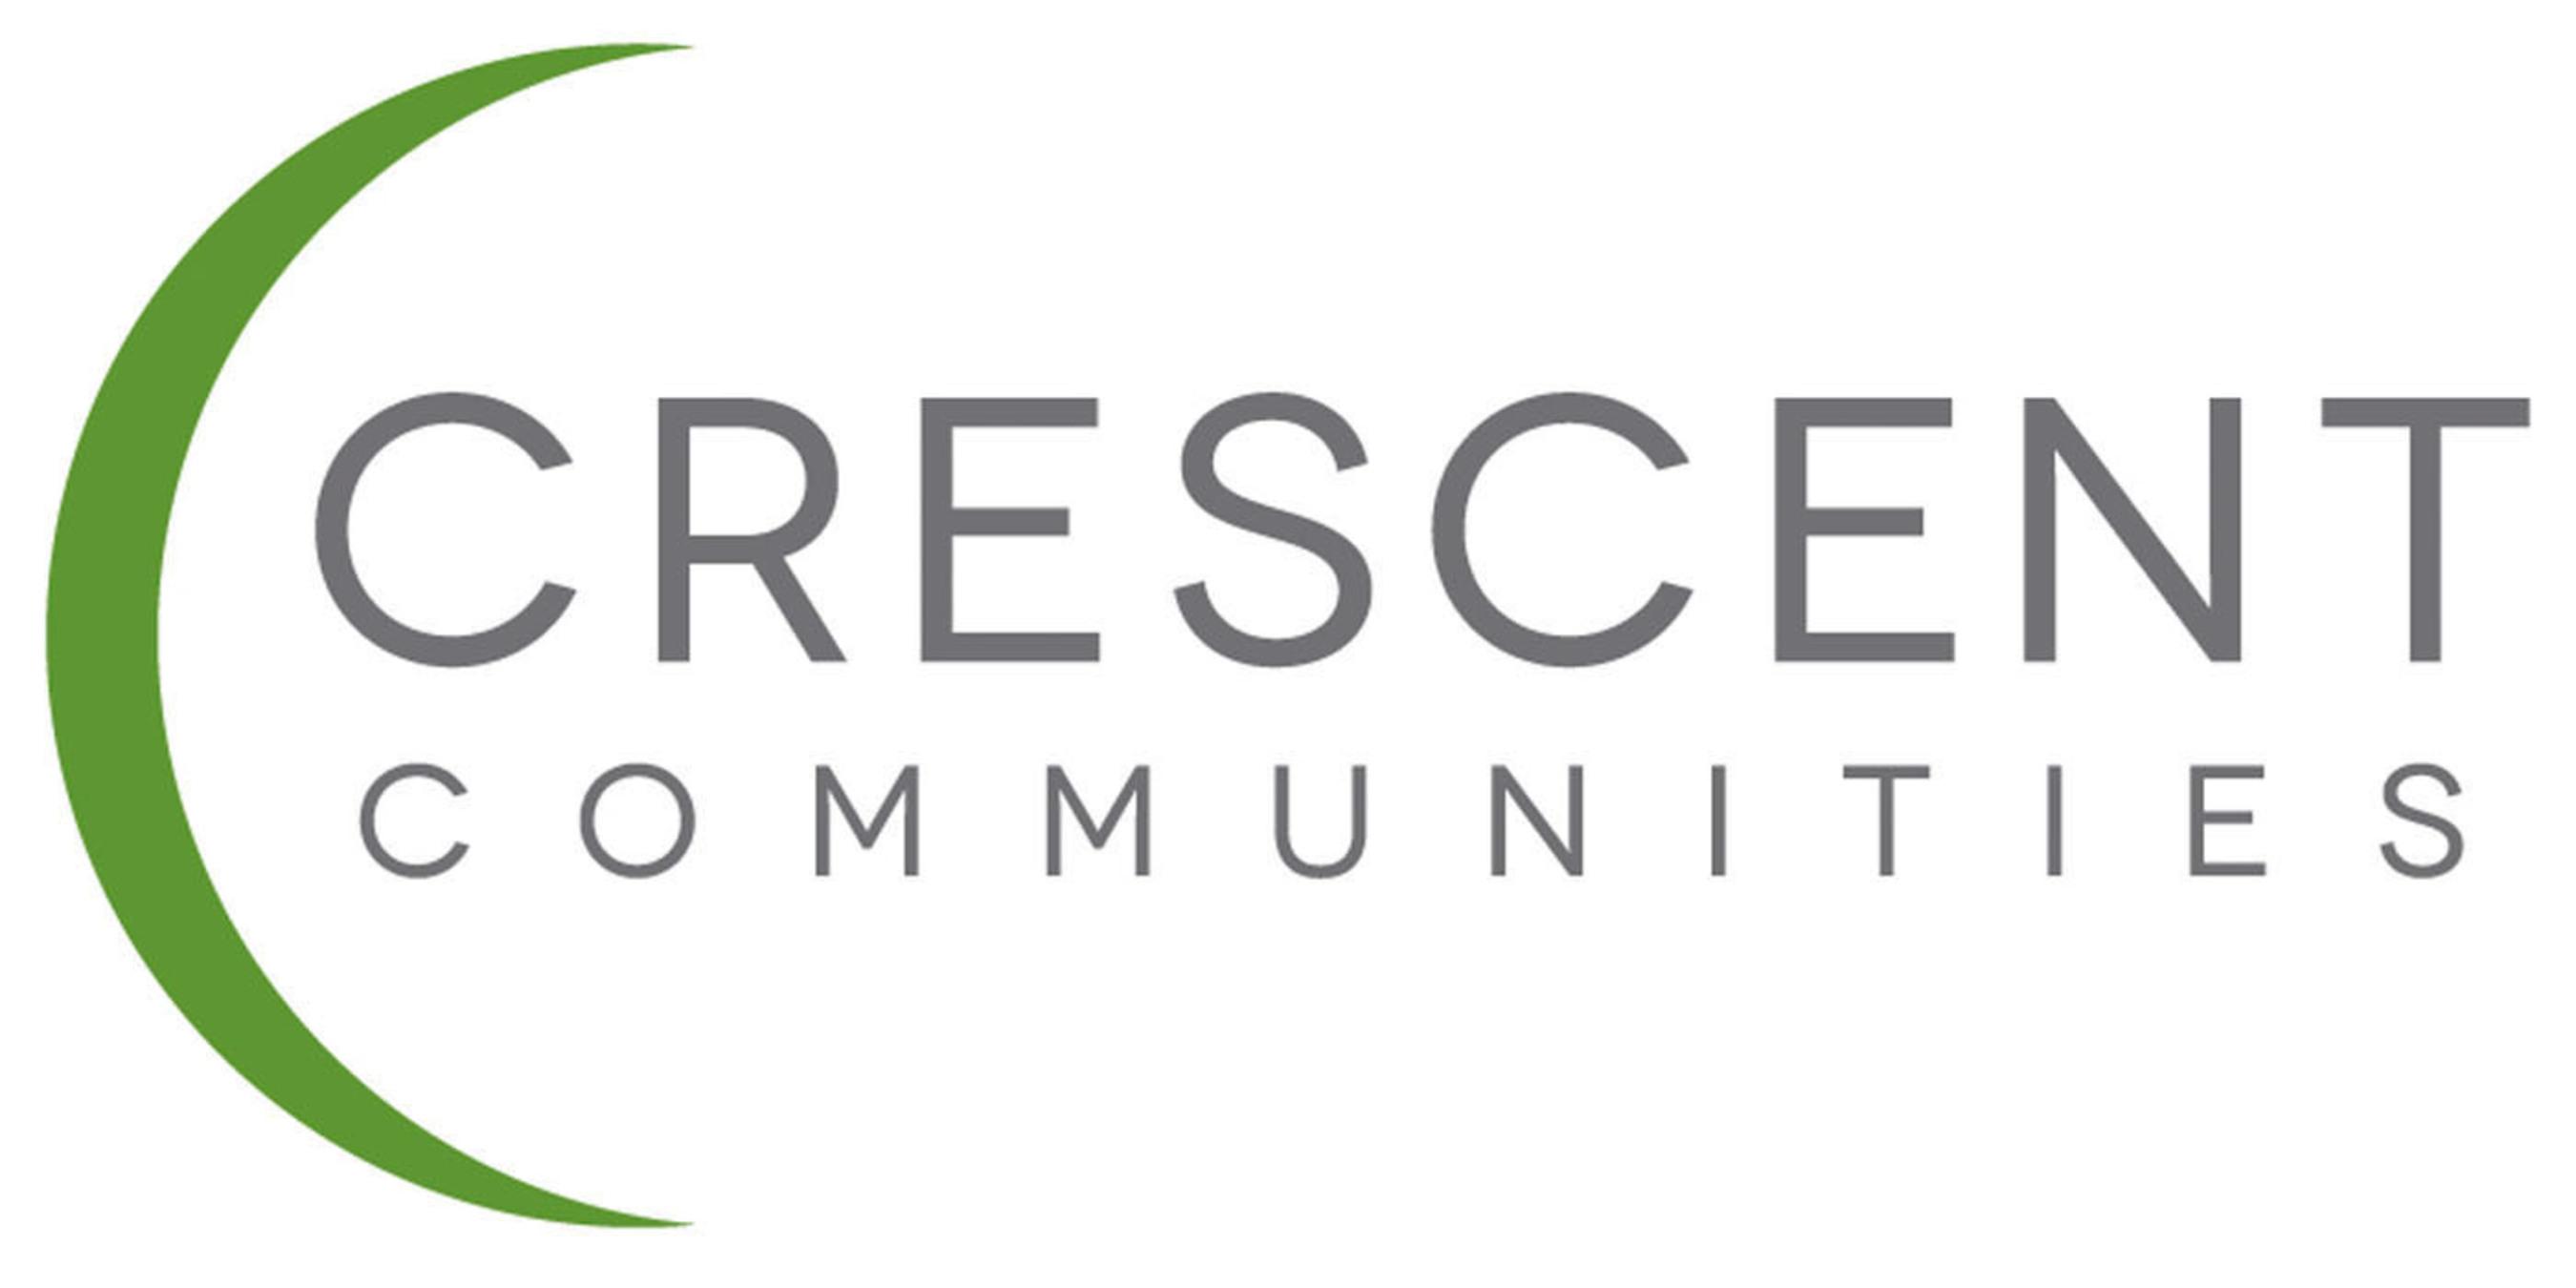 Crescent Communities logo.